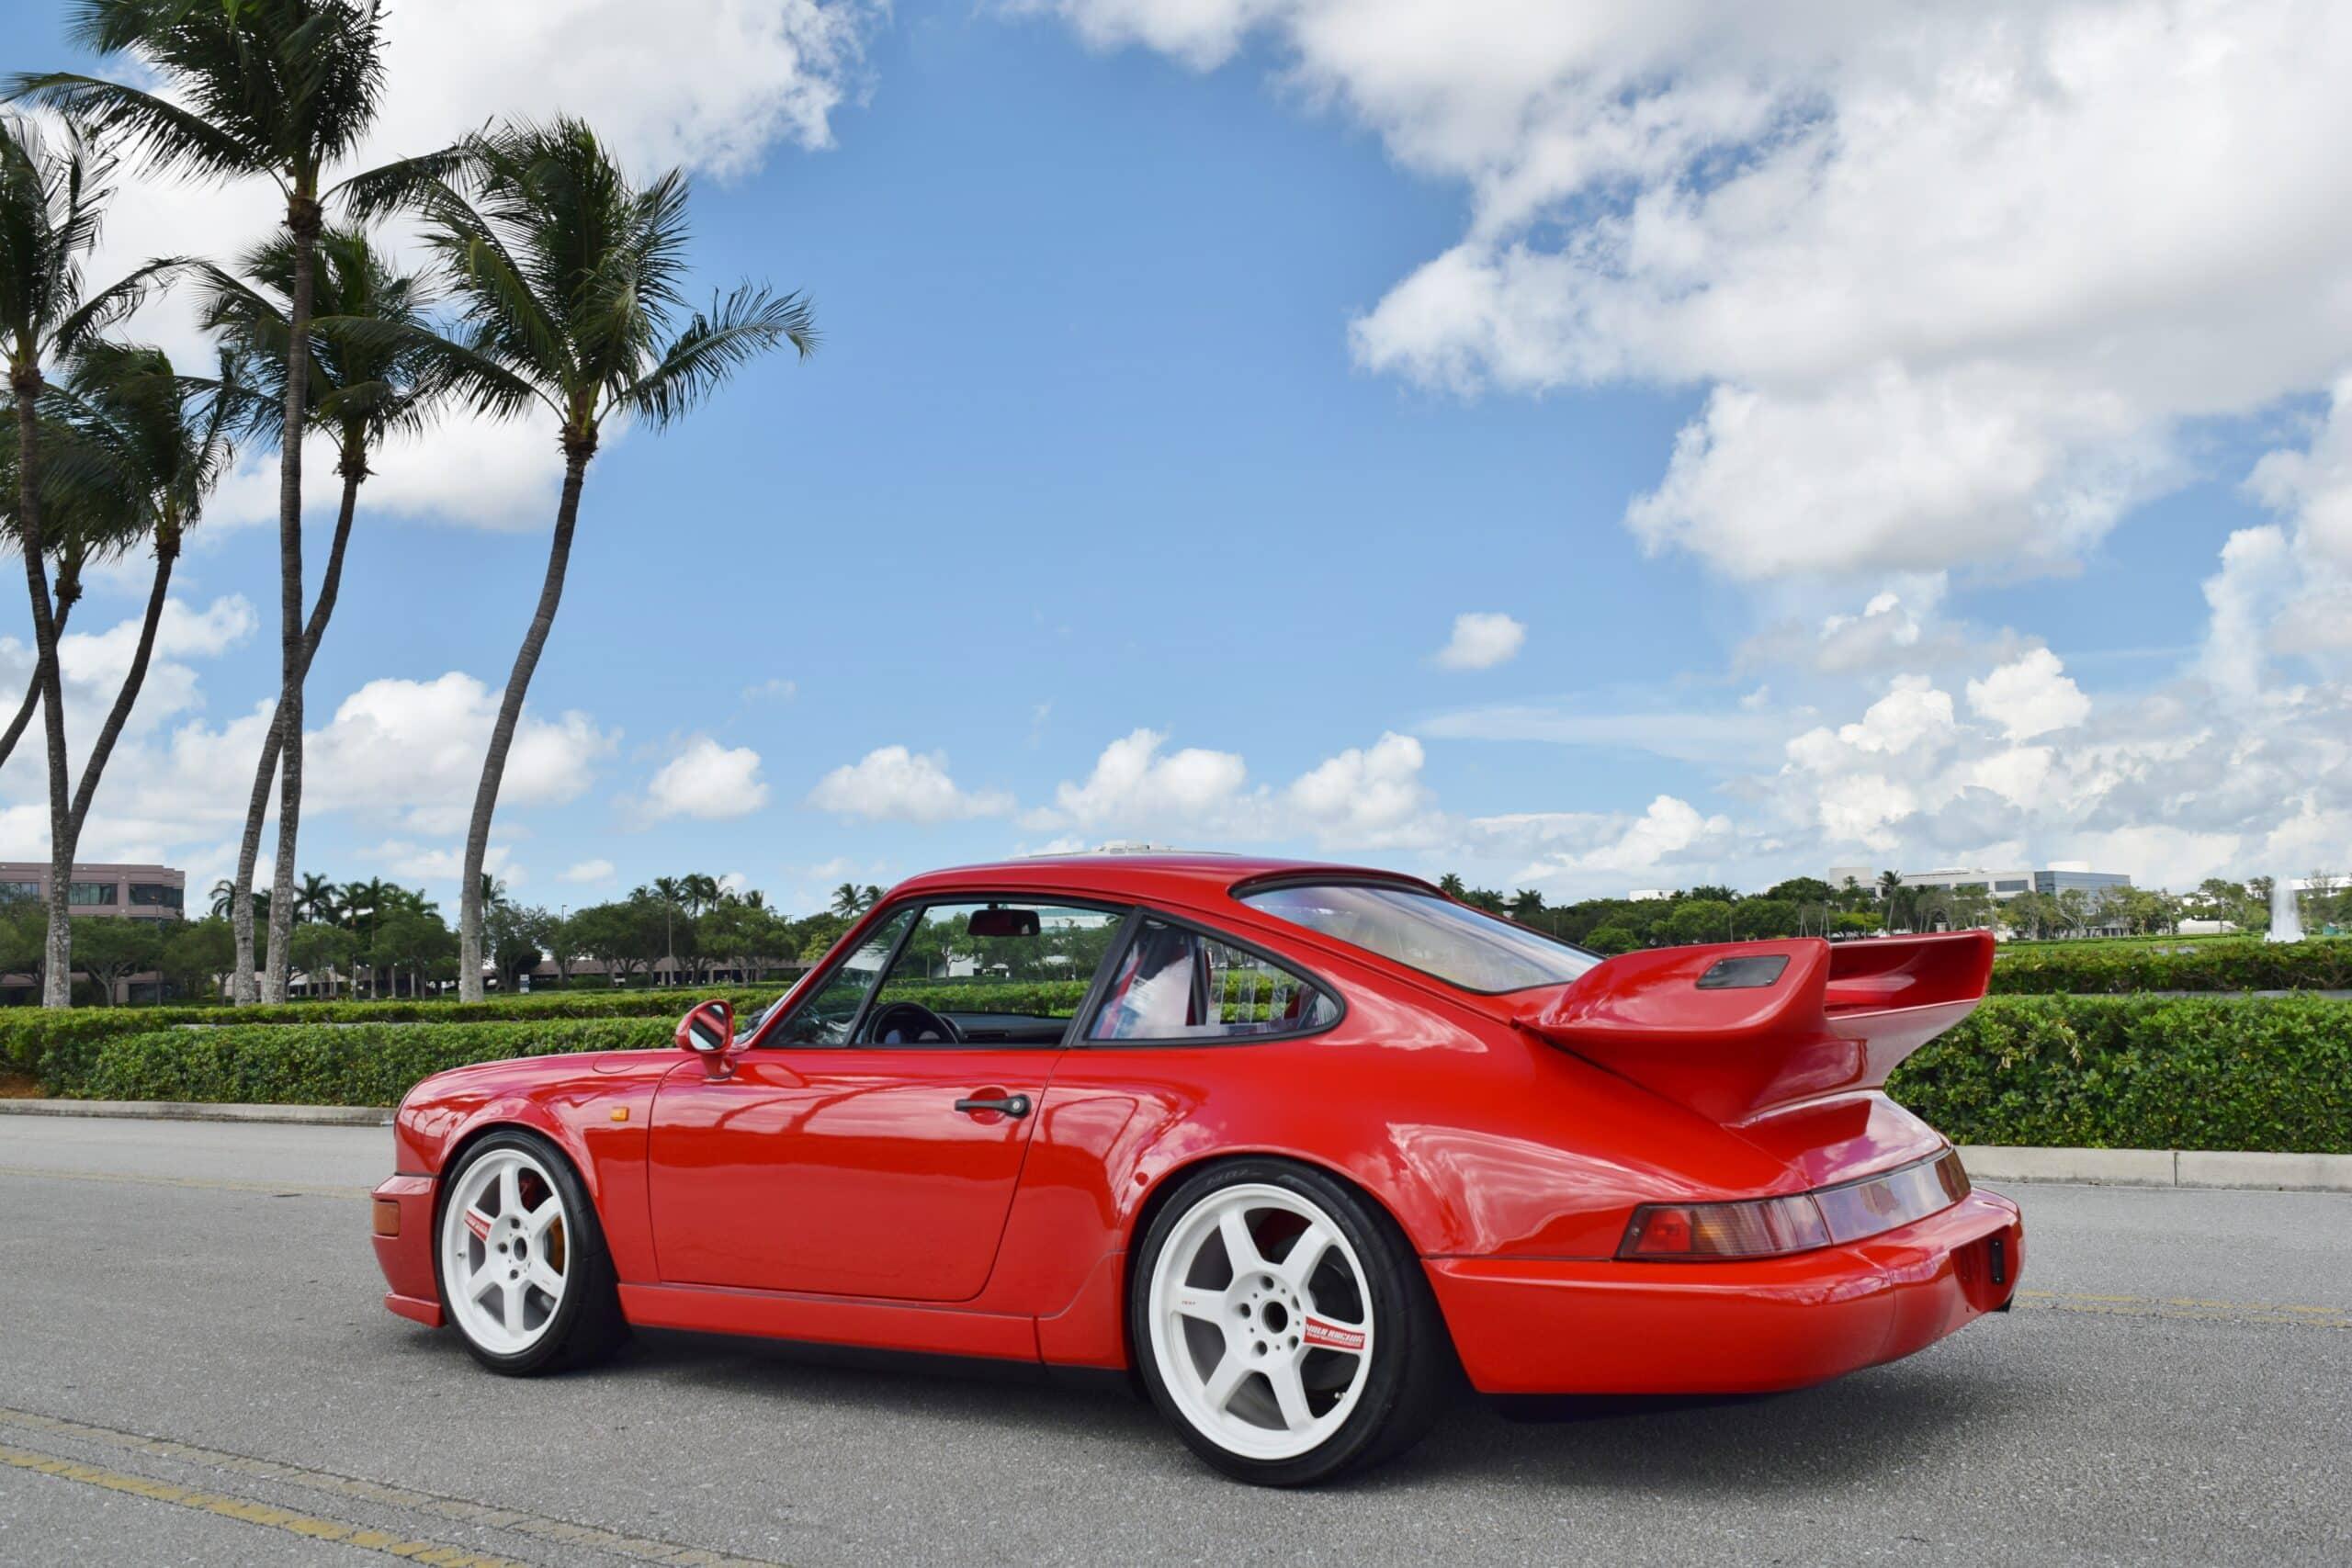 1990 Porsche 911 964 Carrera 2 LOW Miles- Euro- Slicktop- LSD- Recaro Seats- Volk Wheels- Matter Cage- 5 Speed